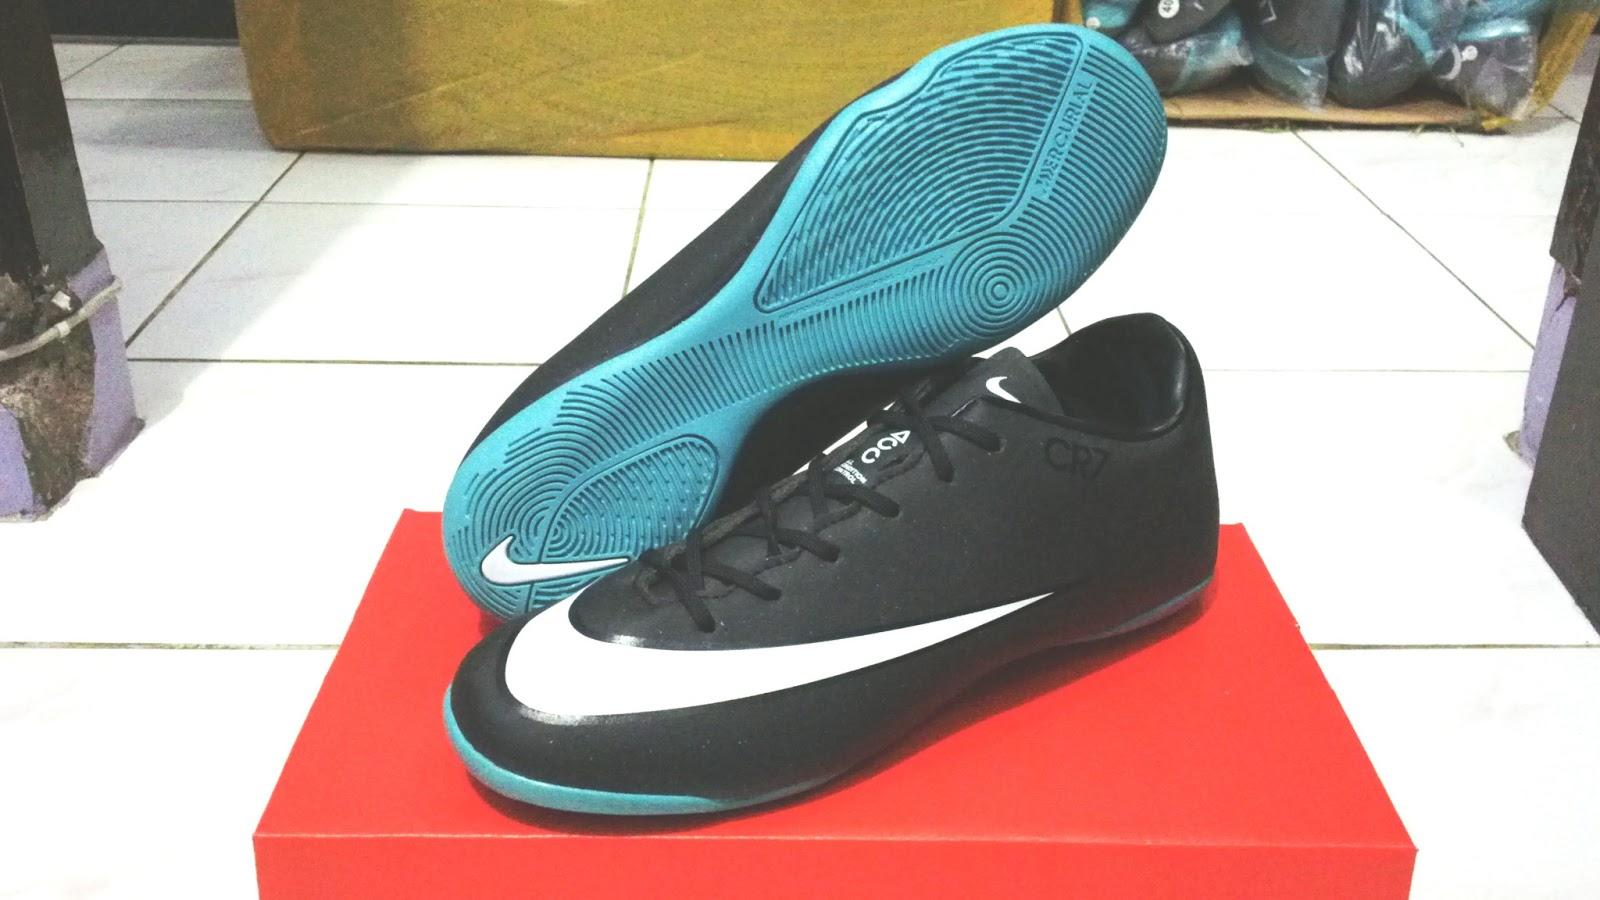 Harga Dan Spesifikasi Sepatu Futsal Anak 1 Terbaru 2018 Acrorip 903 One Phase Print Tinta Putih Warna Bersamaan Nike 082370086410 Nikesepatu Bola Nikebq